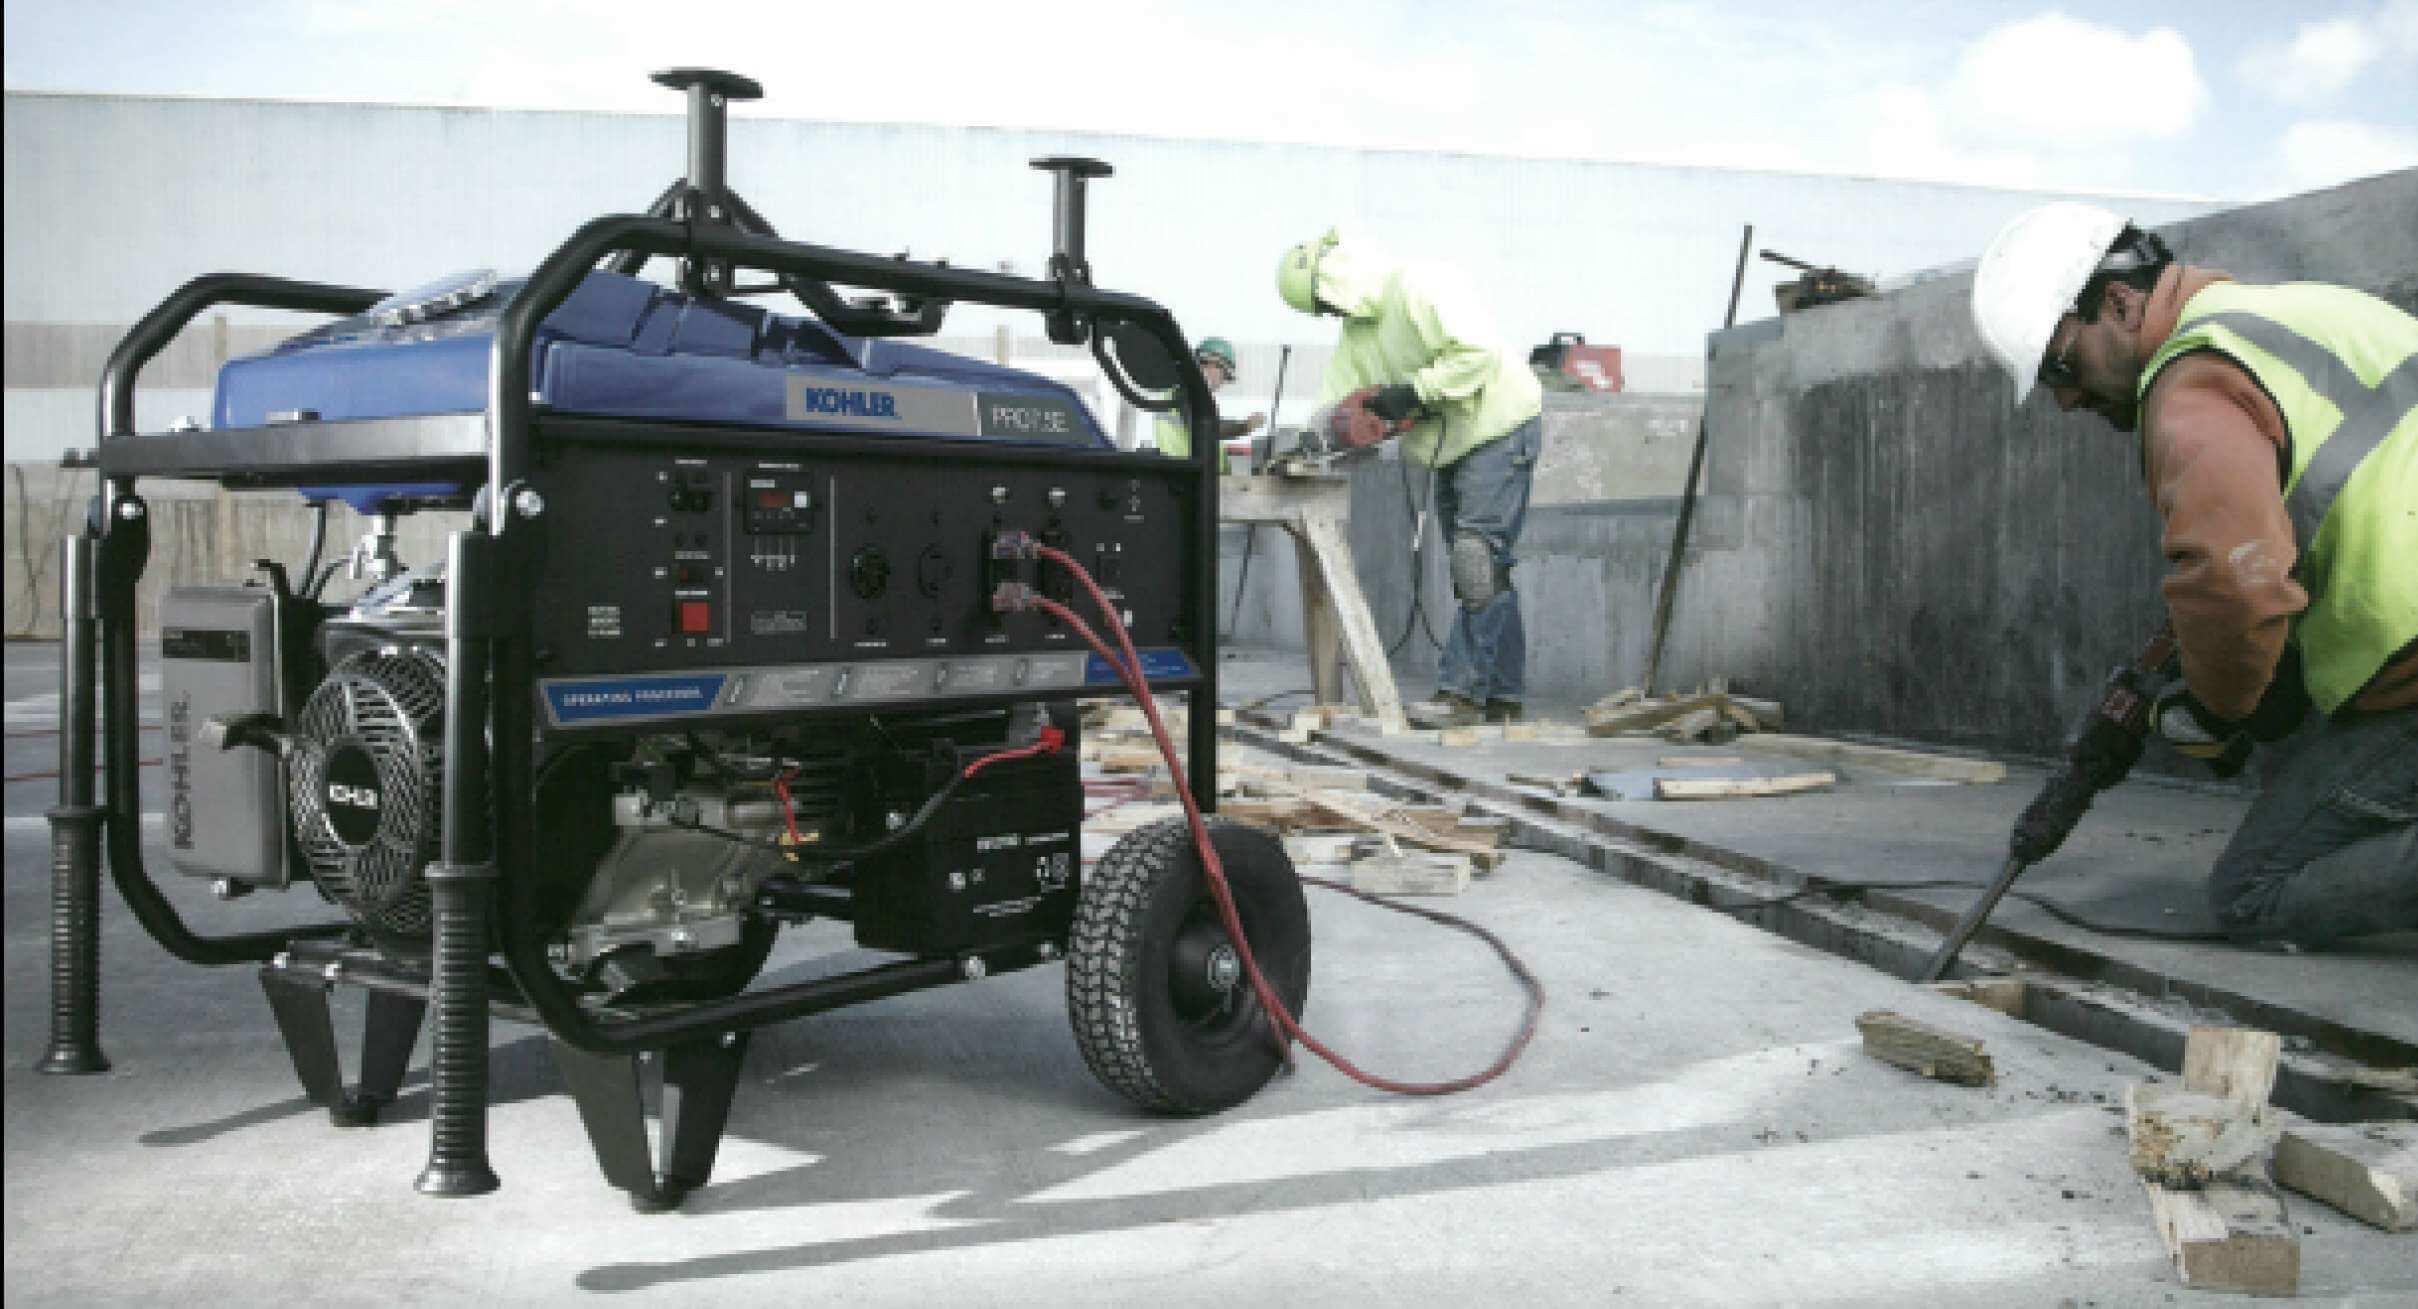 Kohler Petrol Generators - 3 5 to 7 5kW | Fred Hopkins